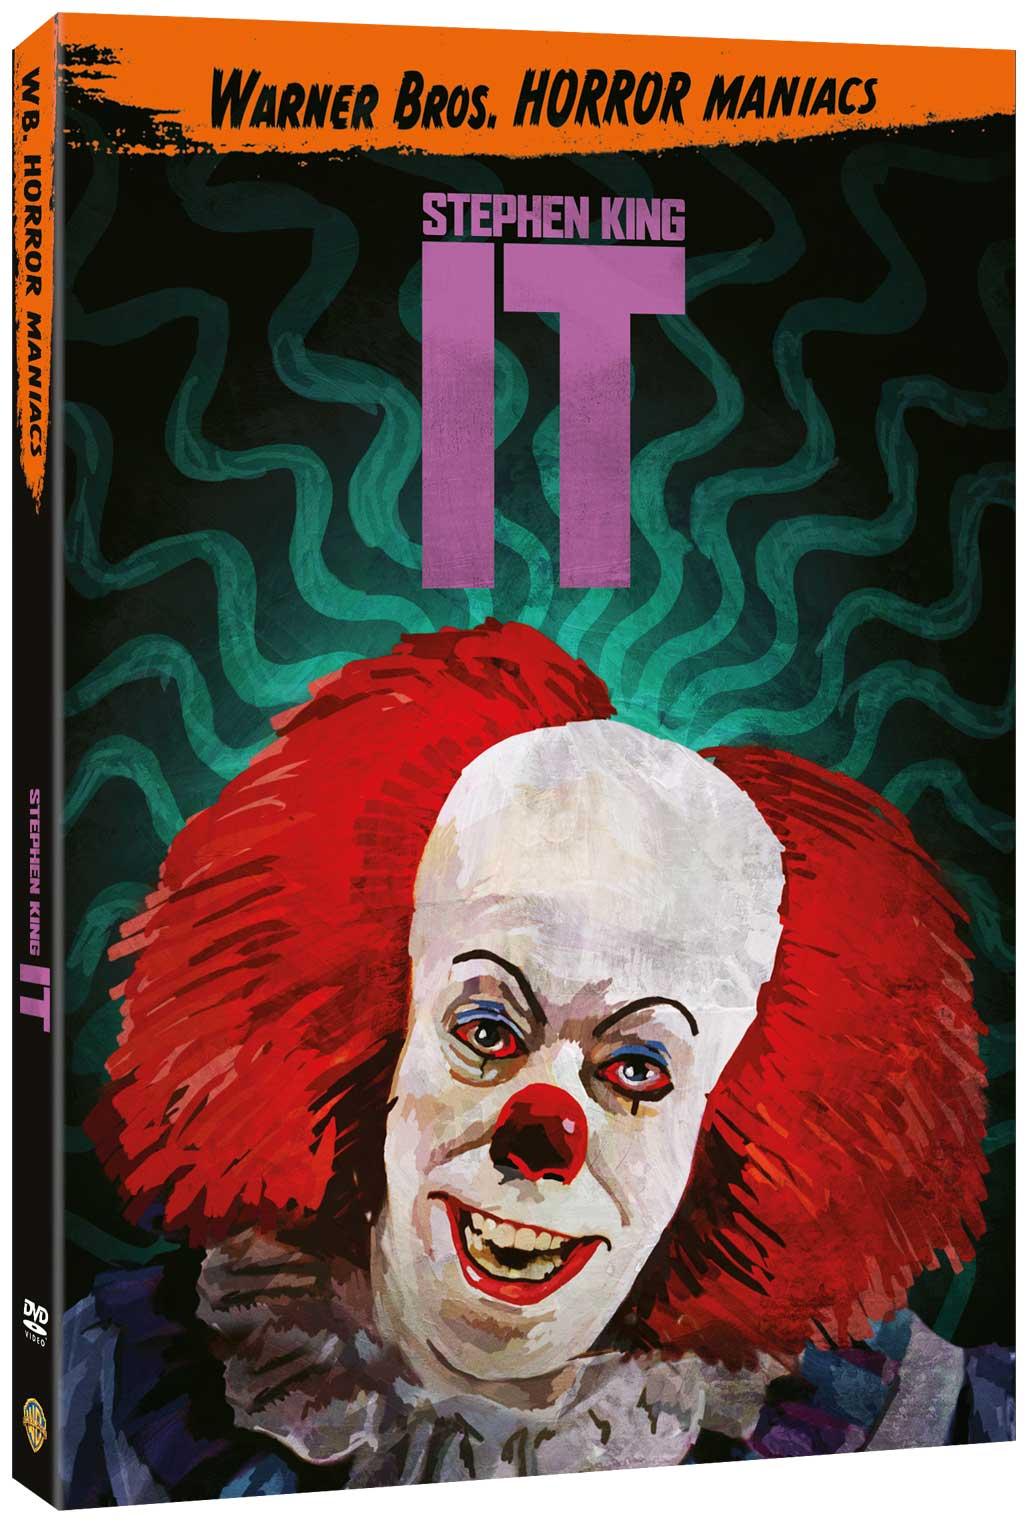 IT (EDIZIONE HORROR MANIACS) (DVD)